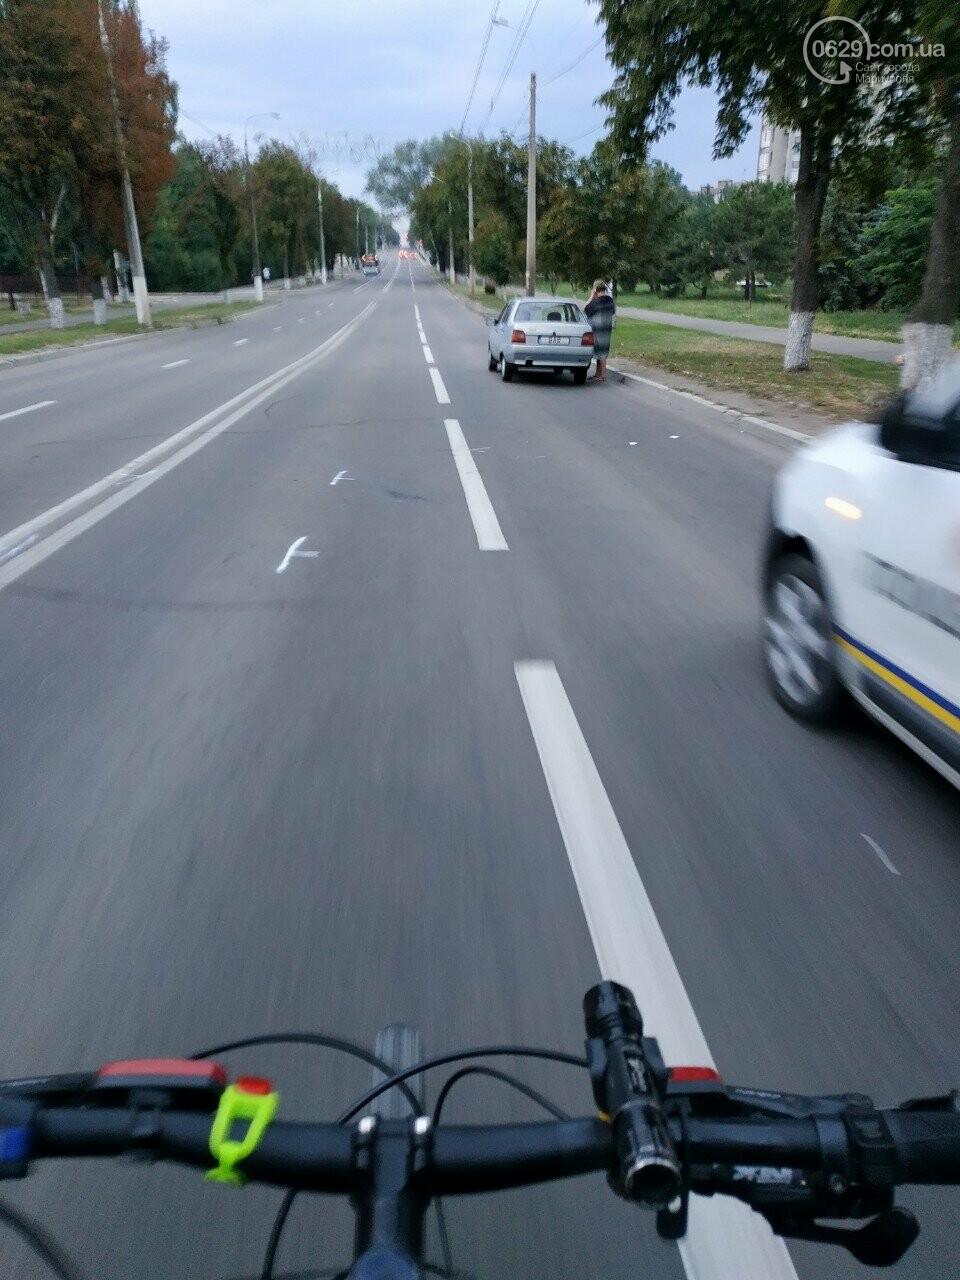 В Мариуполе под колеса «Славуты» попал пешеход, - ФОТО, фото-7